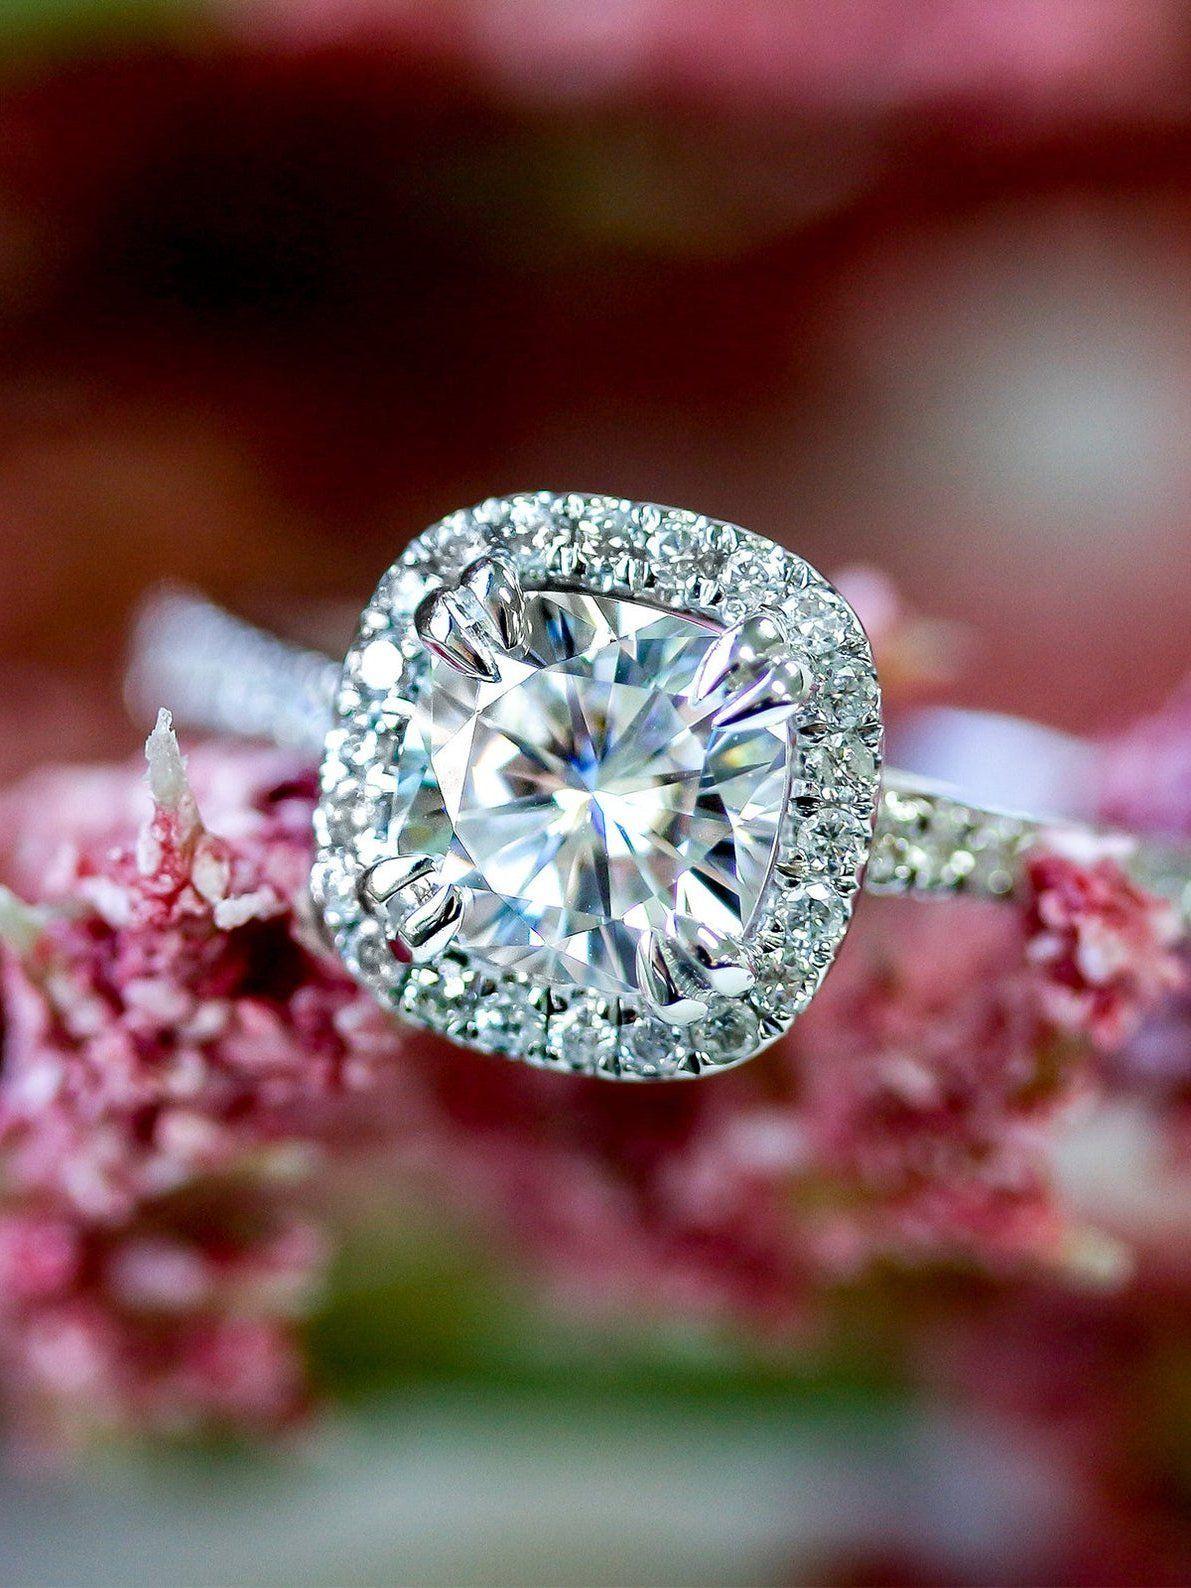 1 1 3 Carats Ct Tw Cushion Halo Moissanite Lab Grown Diamond Engagement Ring In 2020 Lab Grown Diamonds Engagement Halo Diamond Engagement Ring 14k Engagement Ring